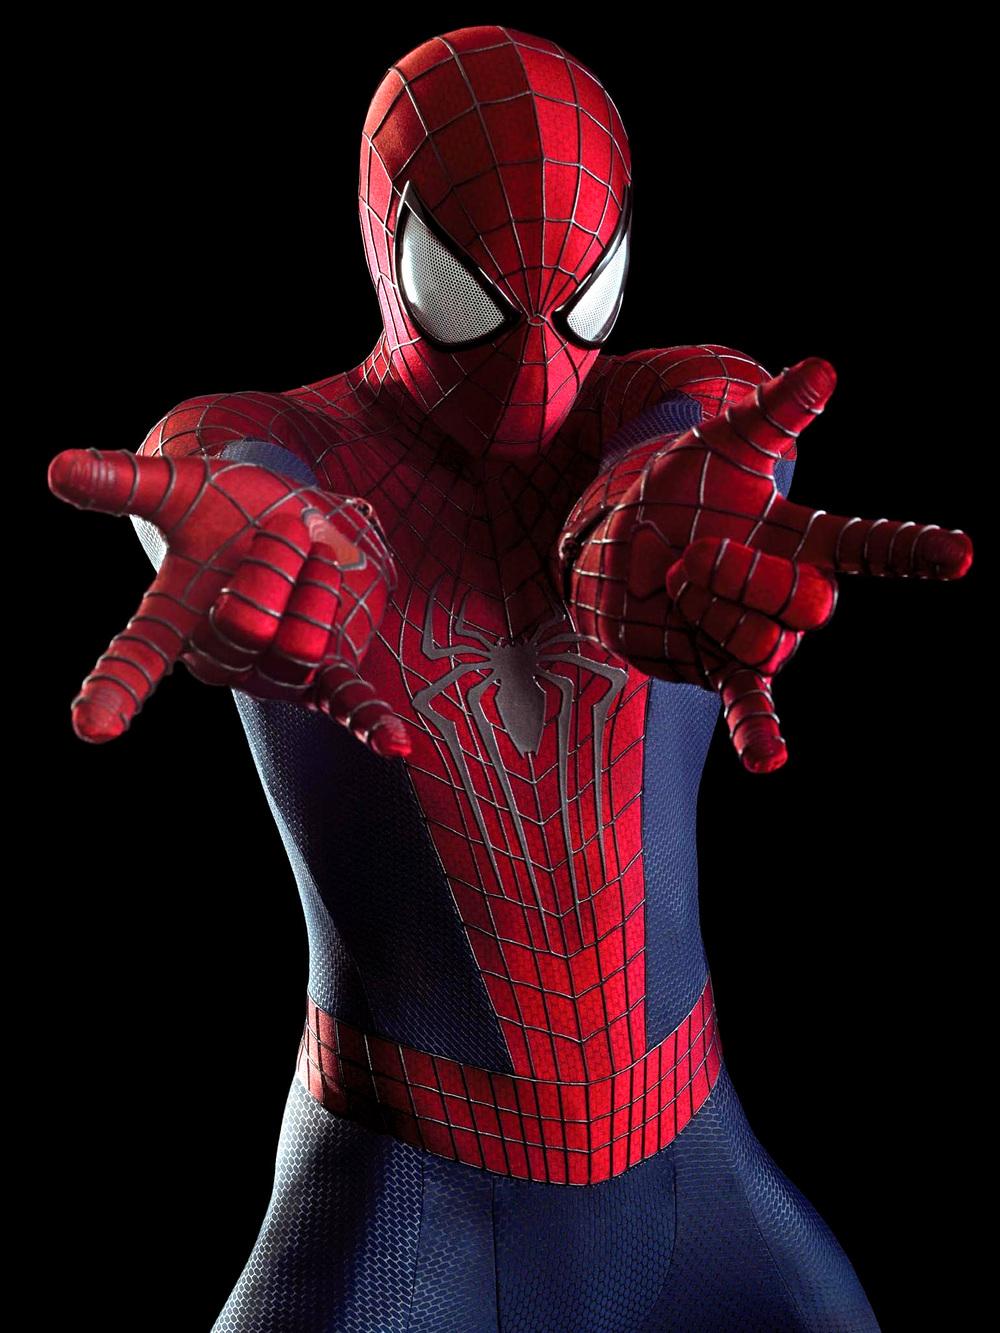 THE AMAZING SPIDER MAN 2 New Details On Spideys Suit GeekTyrant